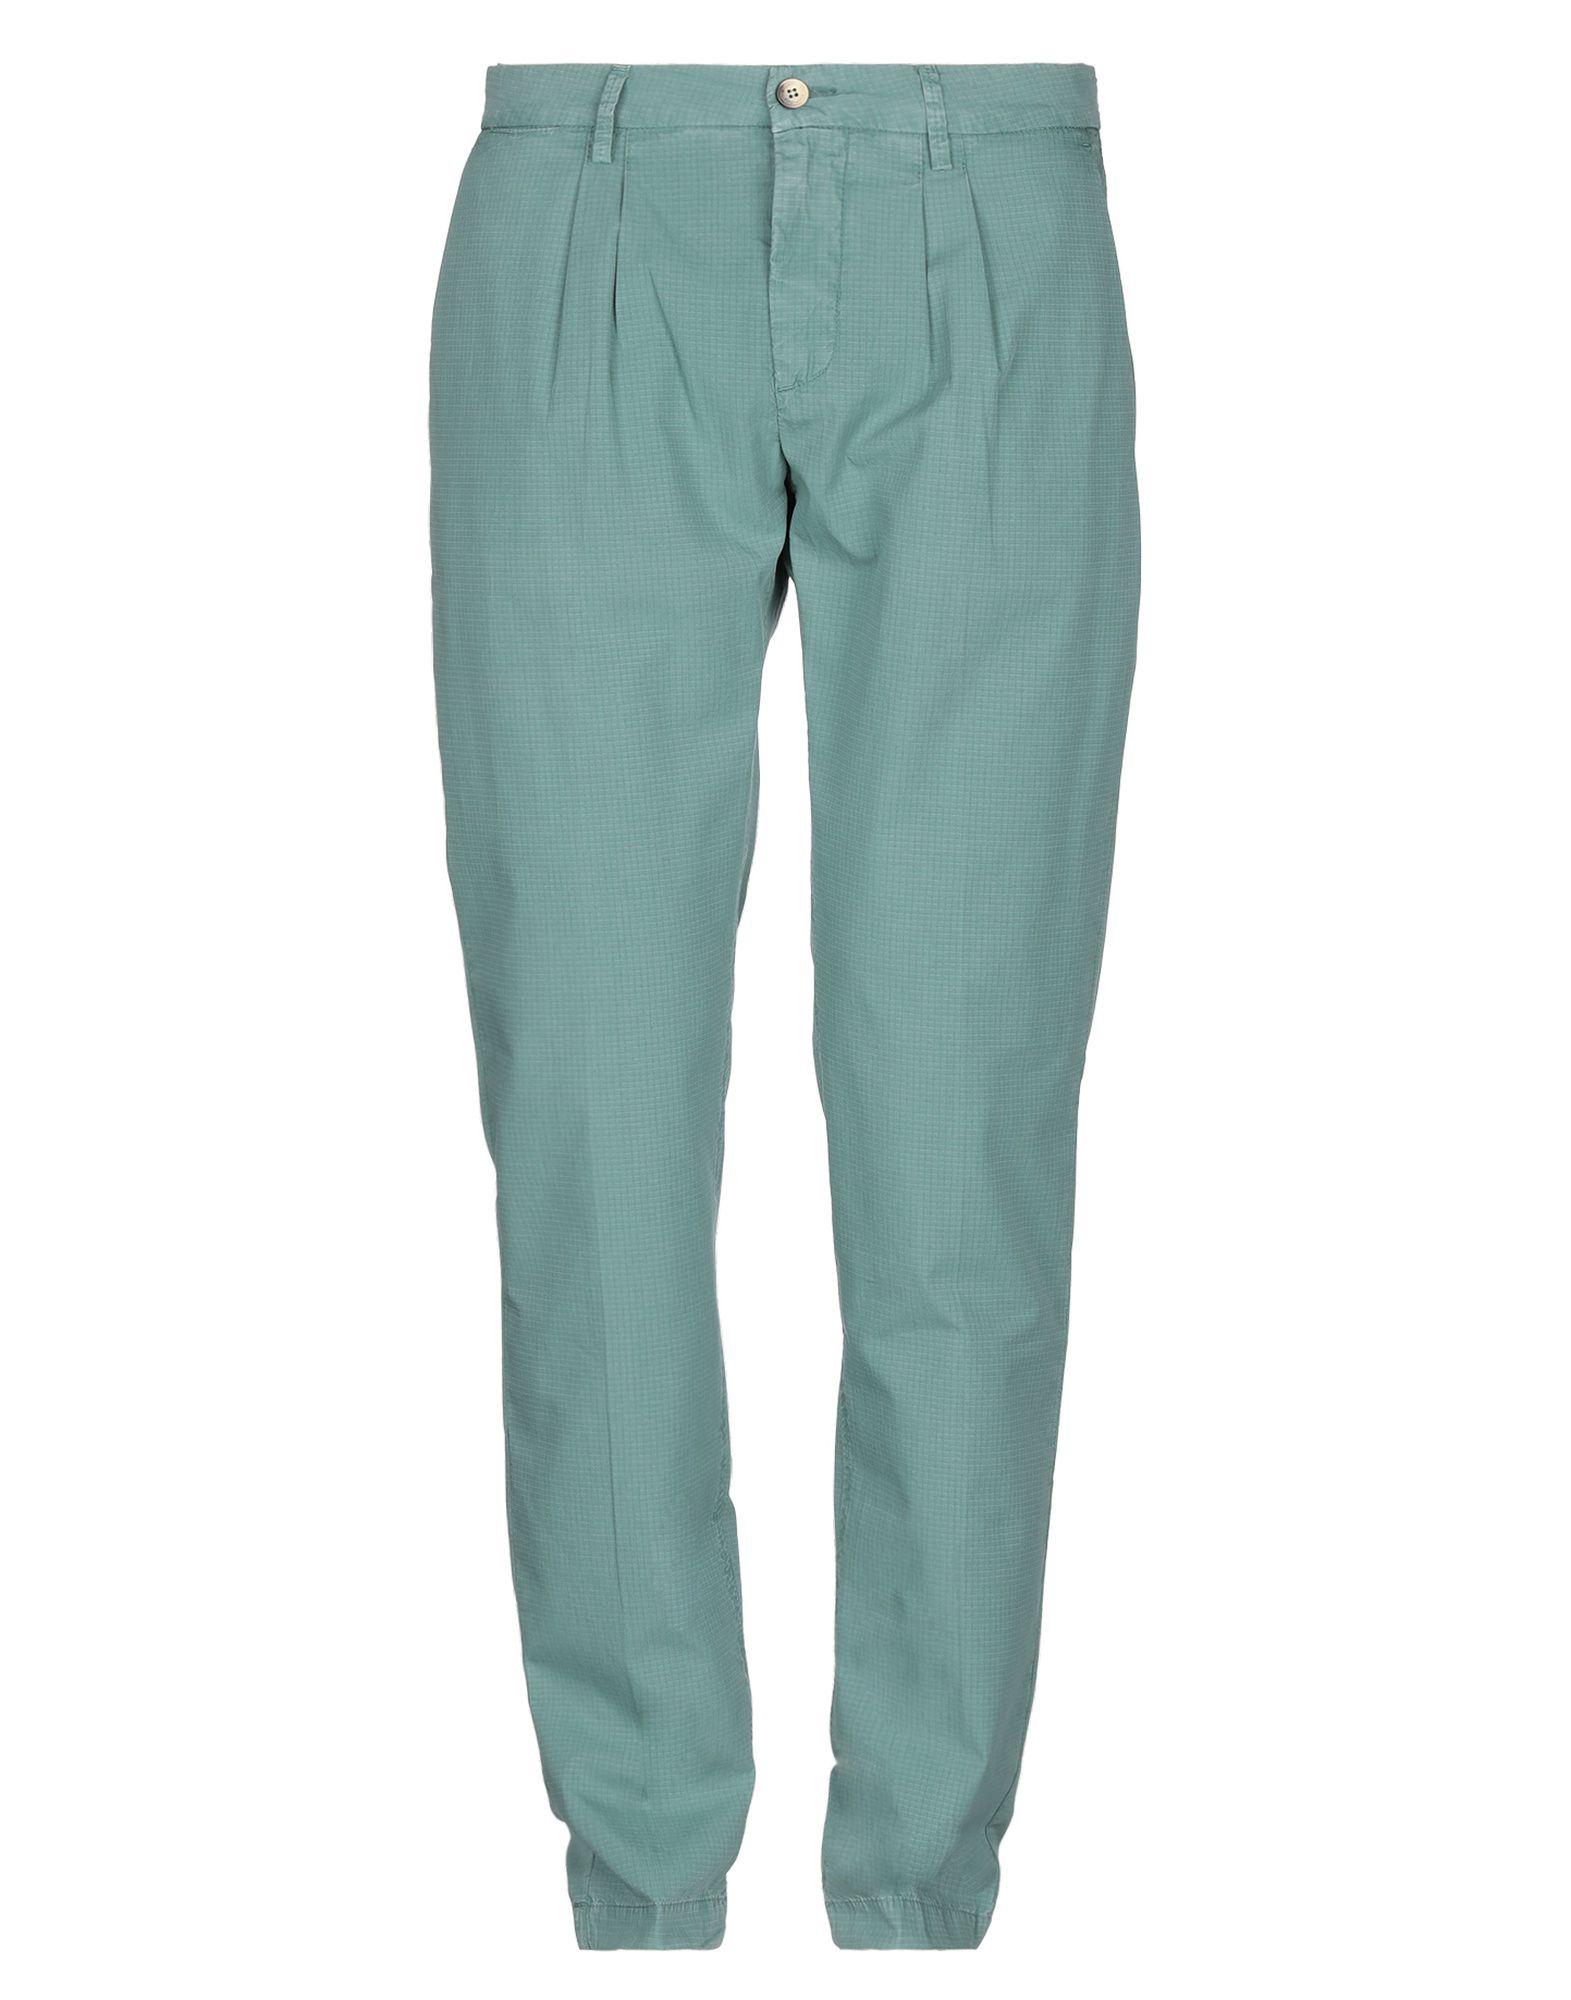 BROOKSFIELD Повседневные брюки брюки чинос quelle quelle 920895